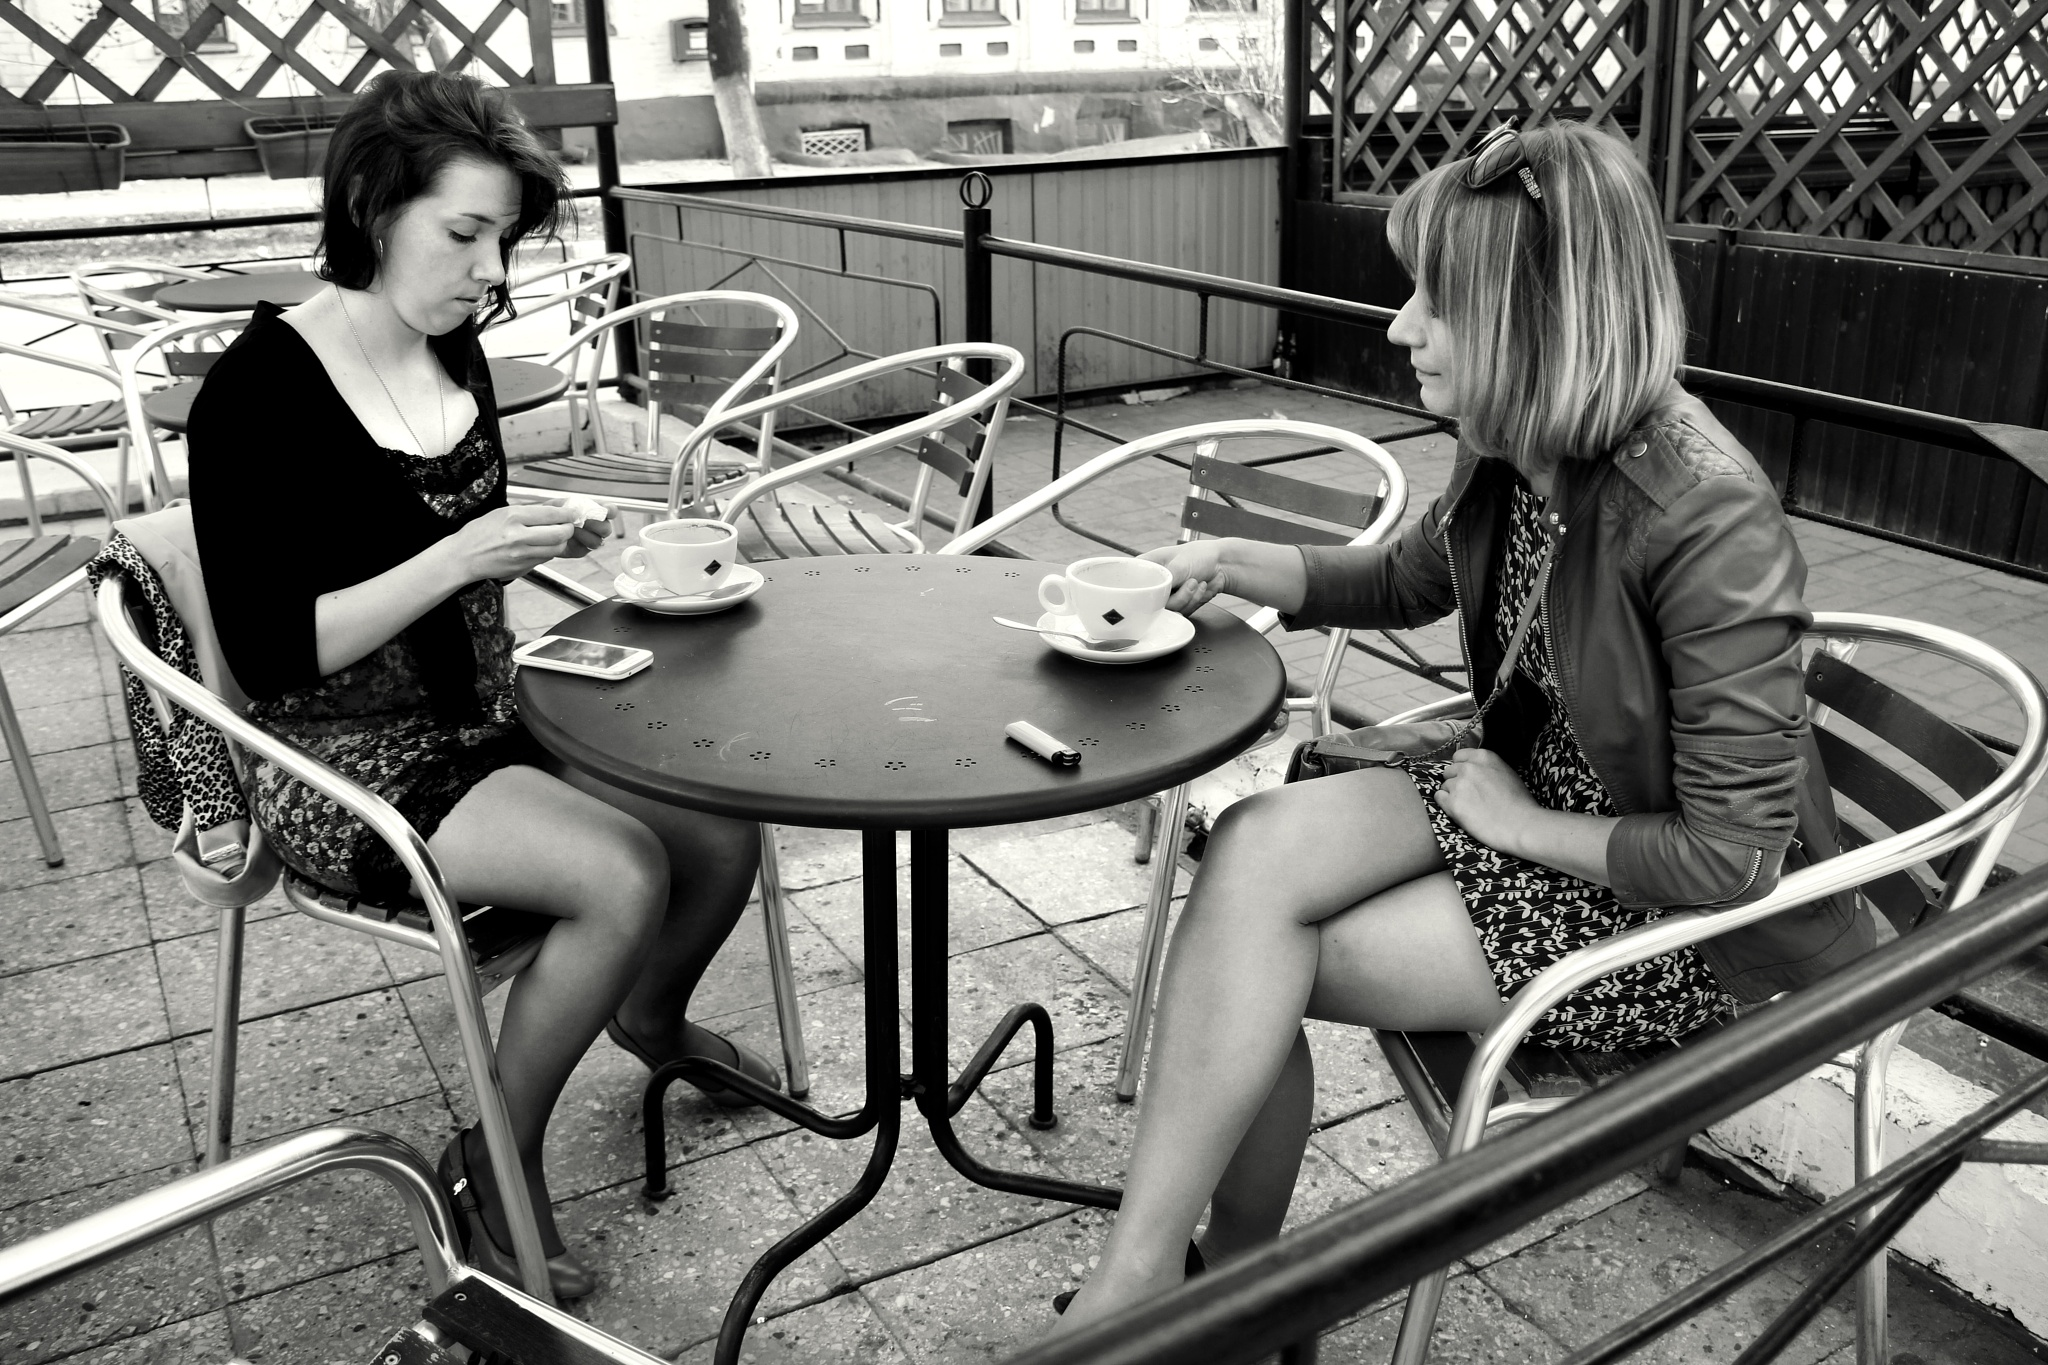 Olya and Lena drink  by Сергей Юрьев